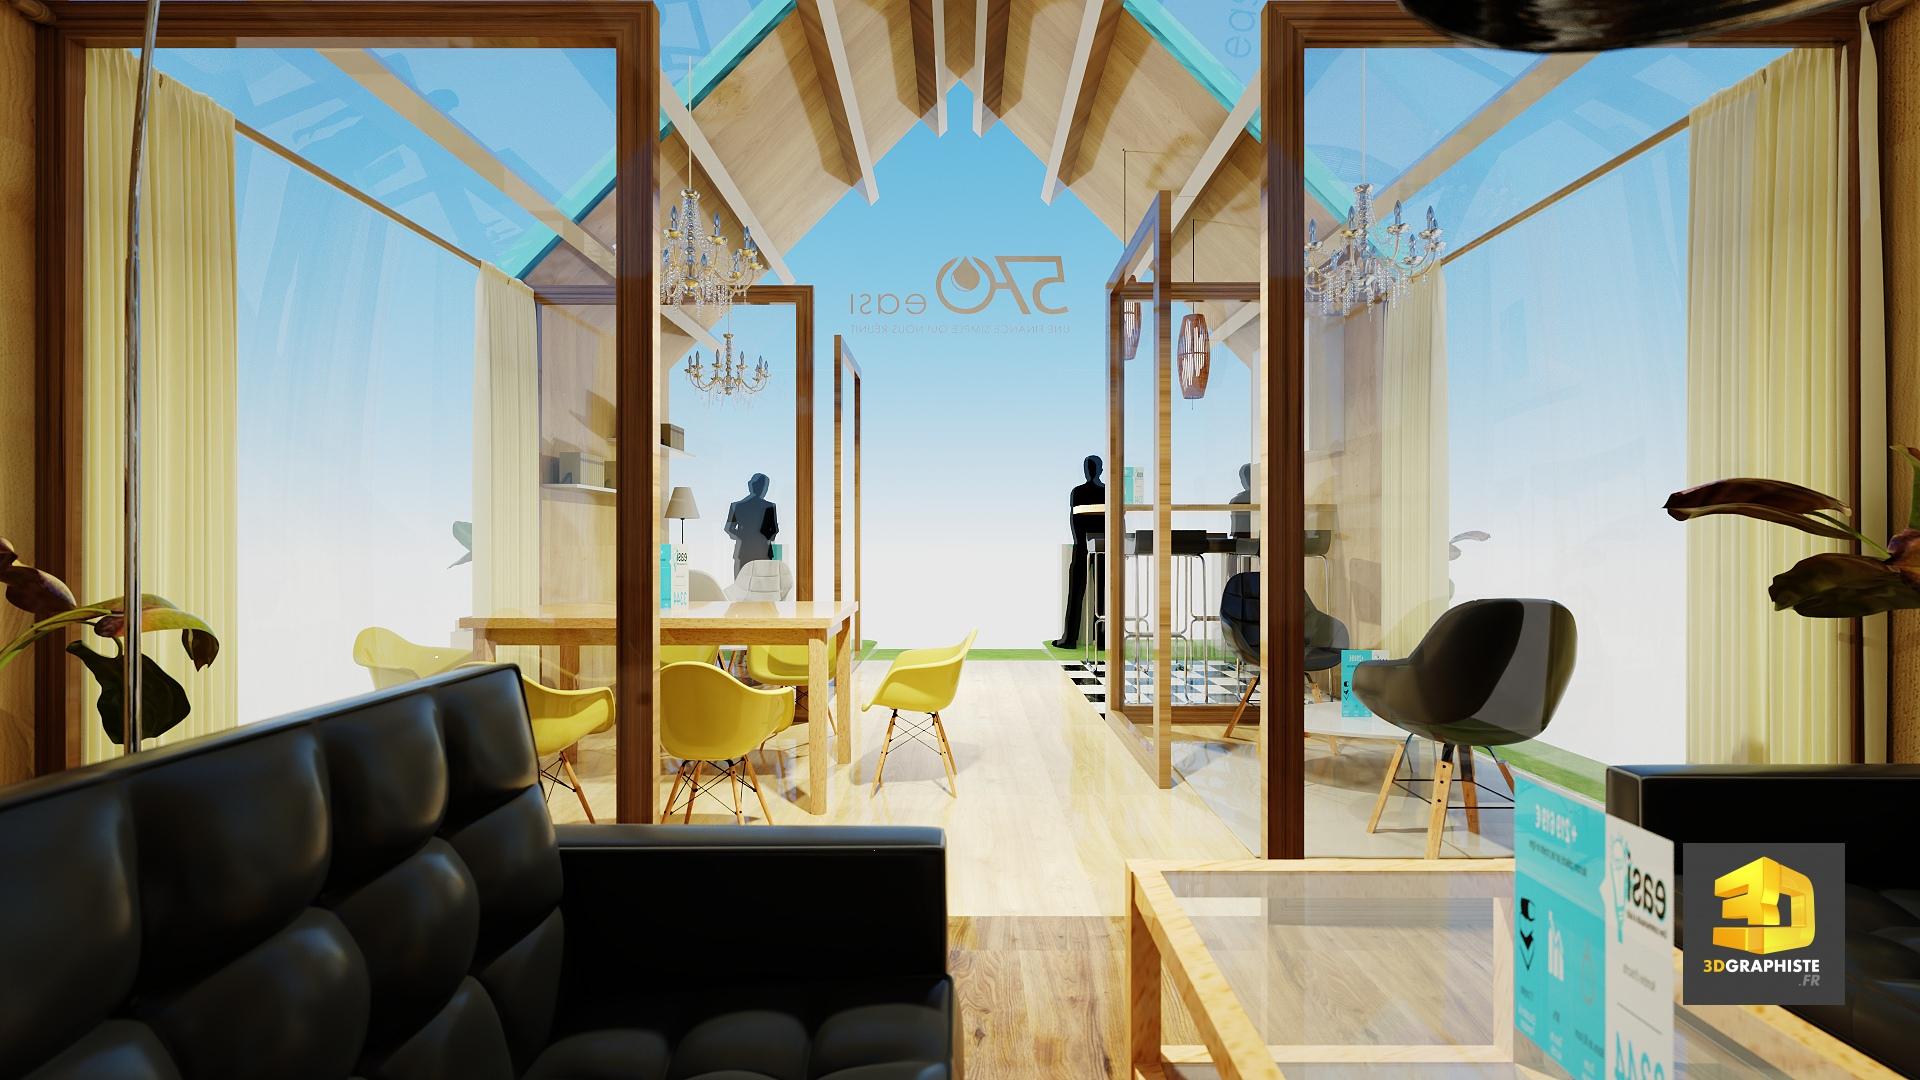 Stand maison 570 easi salon ramf 3dgraphiste fr for Salon immobilier